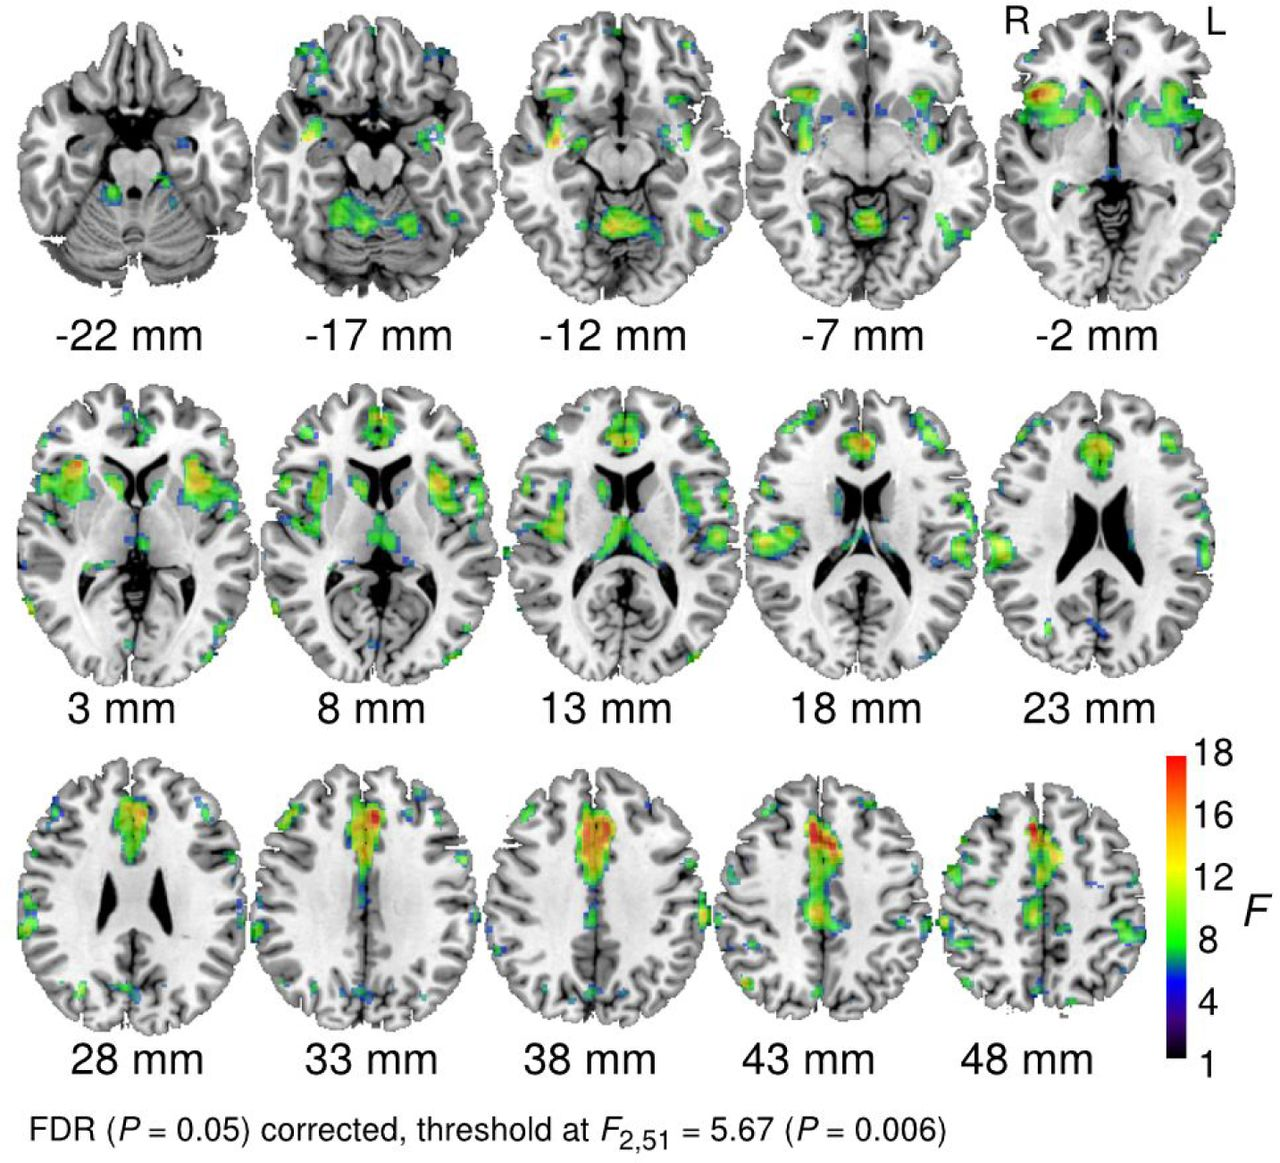 Glucocorticoids and cortical decoding in the phobic brain | bioRxiv